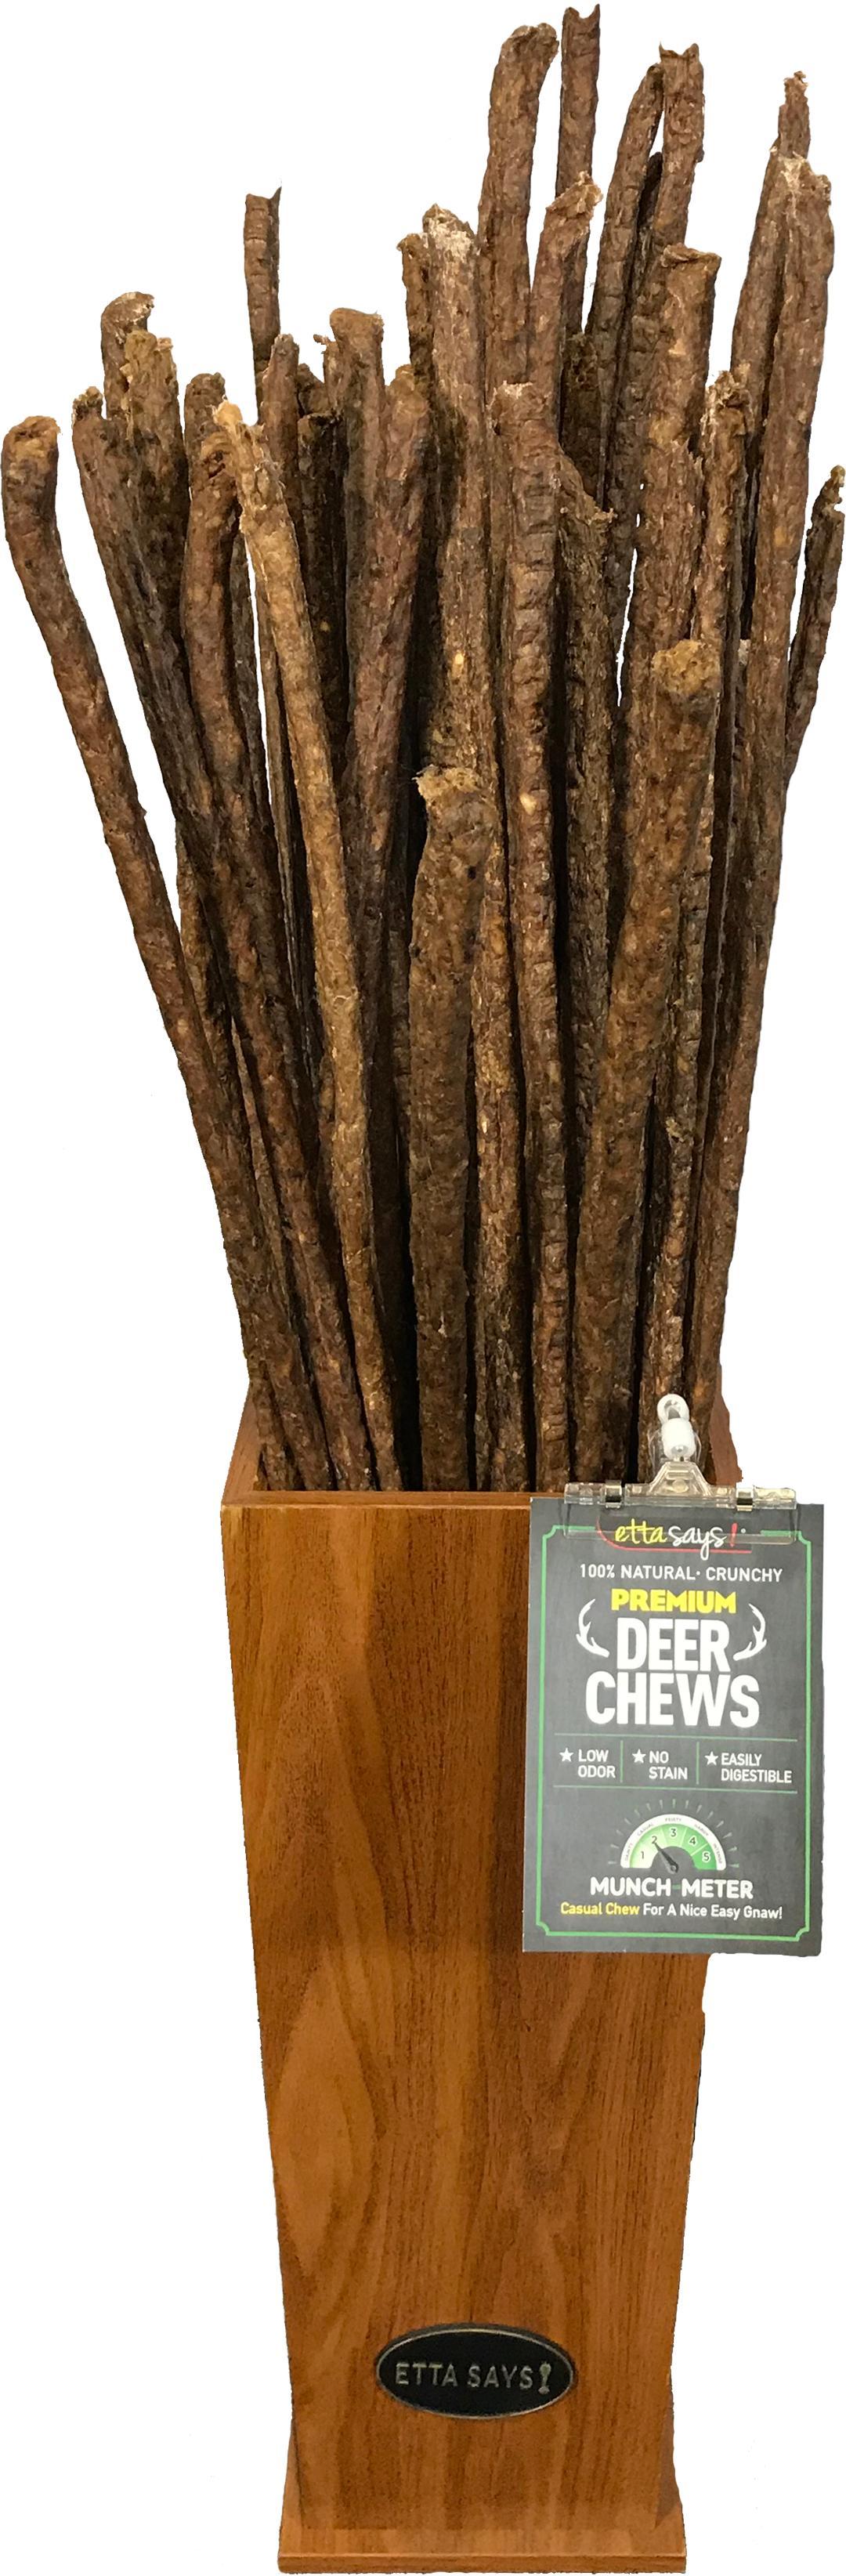 Etta Says! 3' Crunchy Deer Chew Stick Dog Treats, 1-count